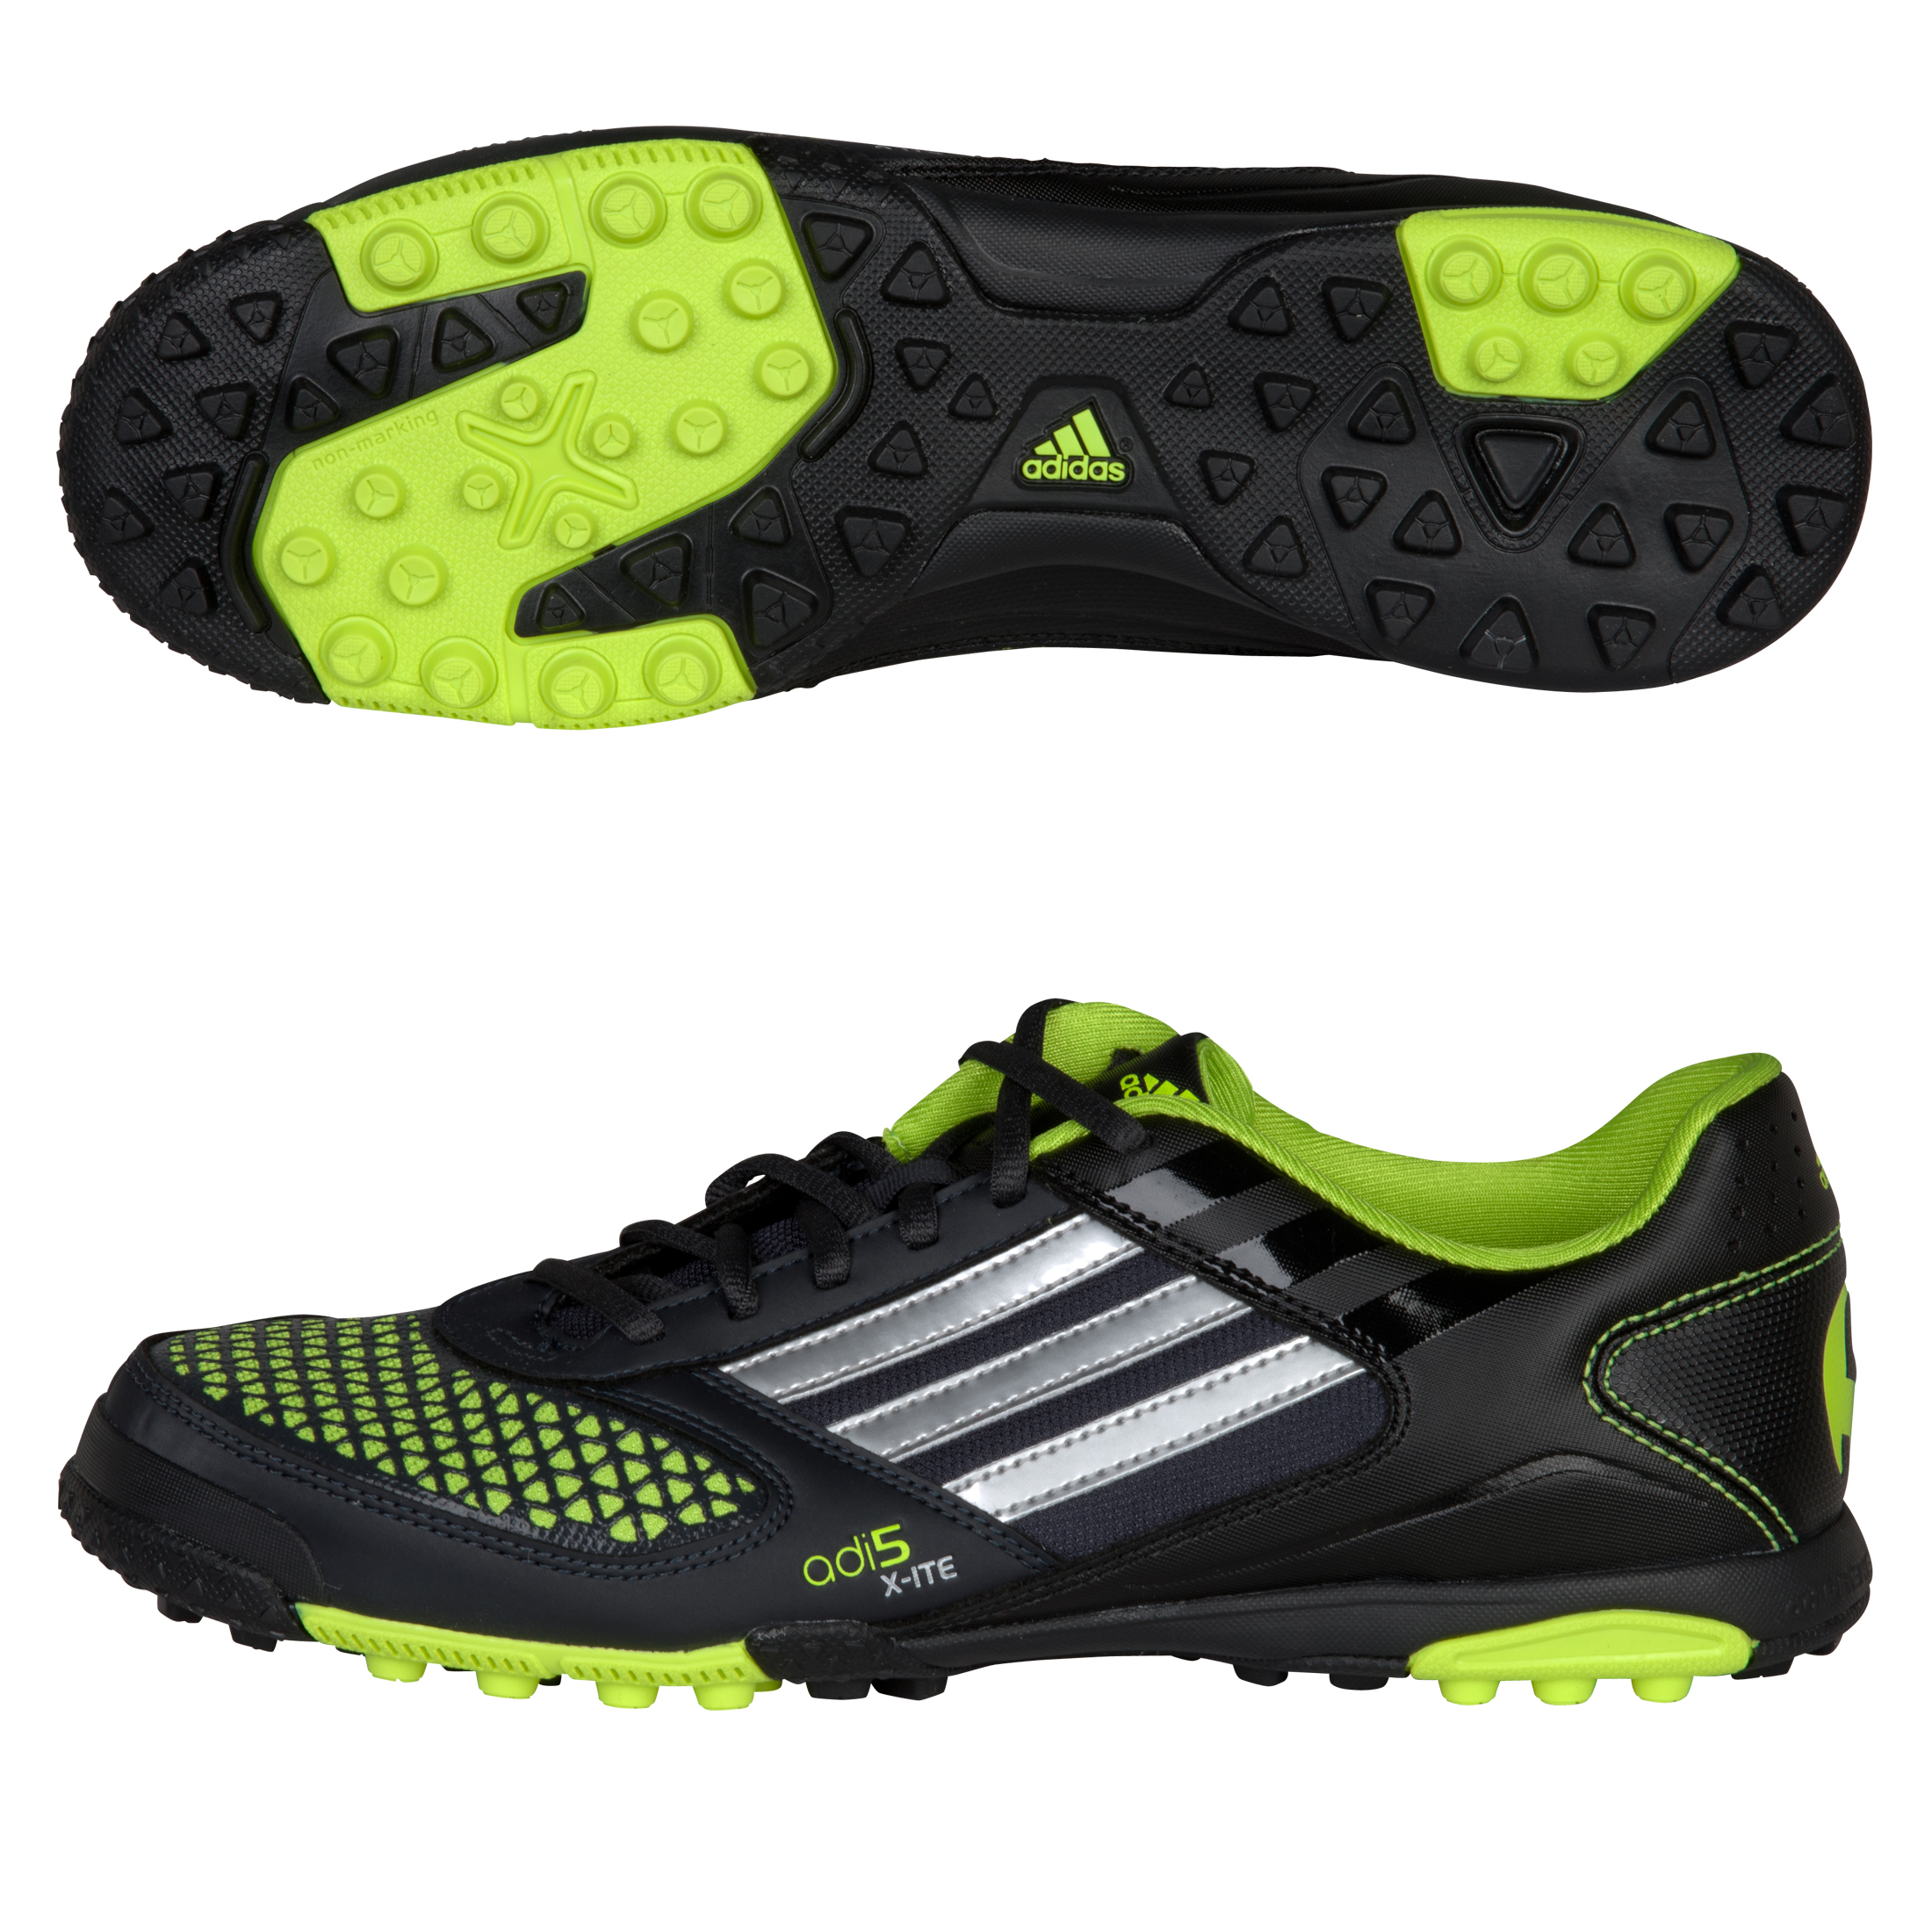 Adidas adi5 Touch Youth Turf Soccer Shoes (PhantomMetallic SilverSlime)